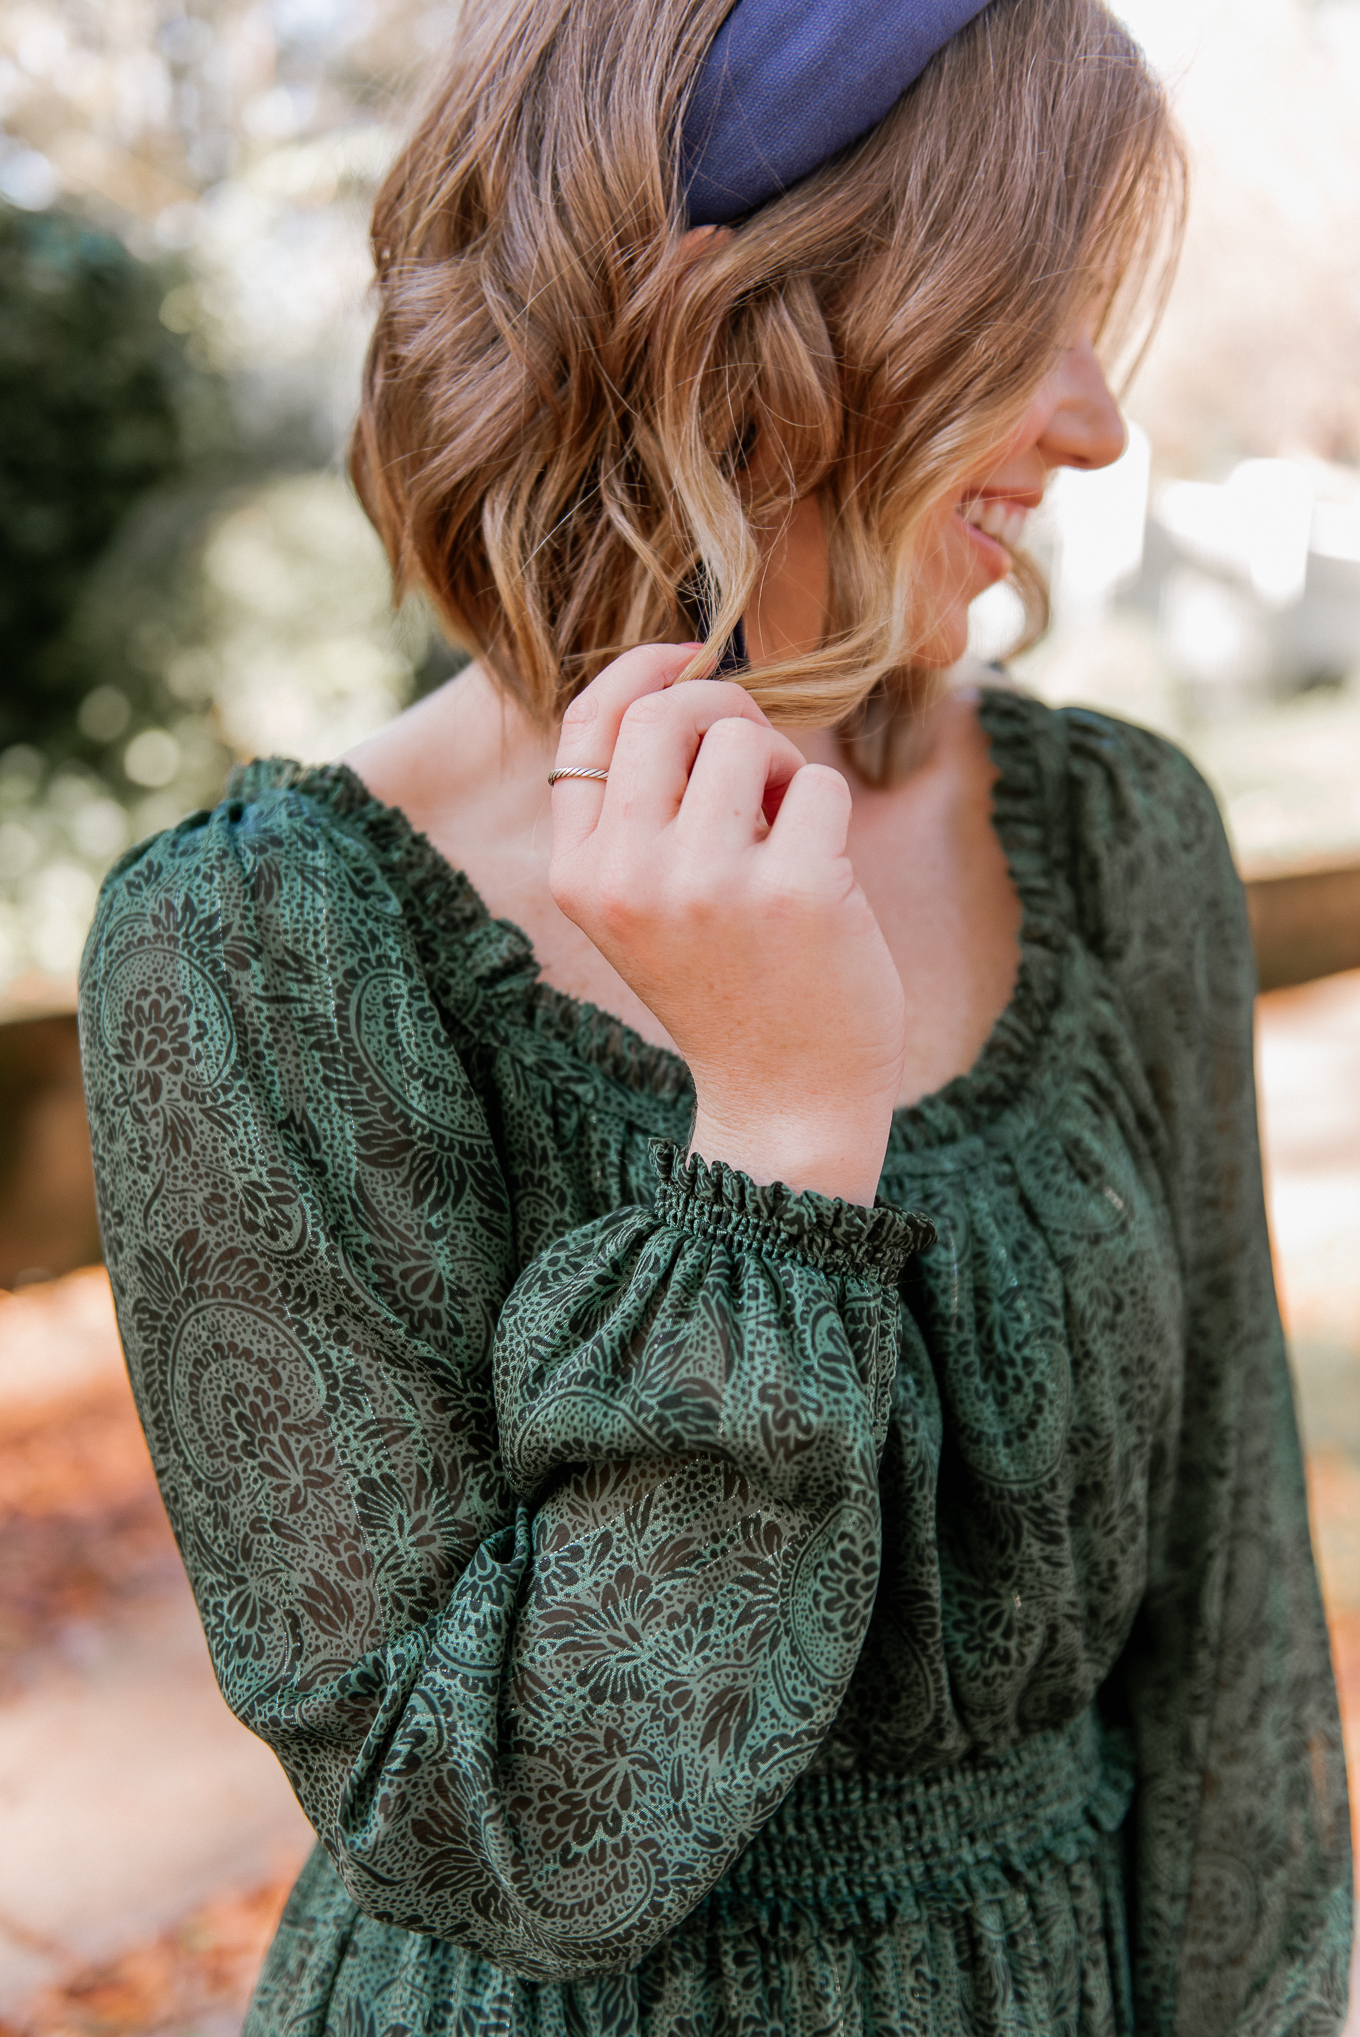 Short Hair Style, Short Lob | Louella Reese